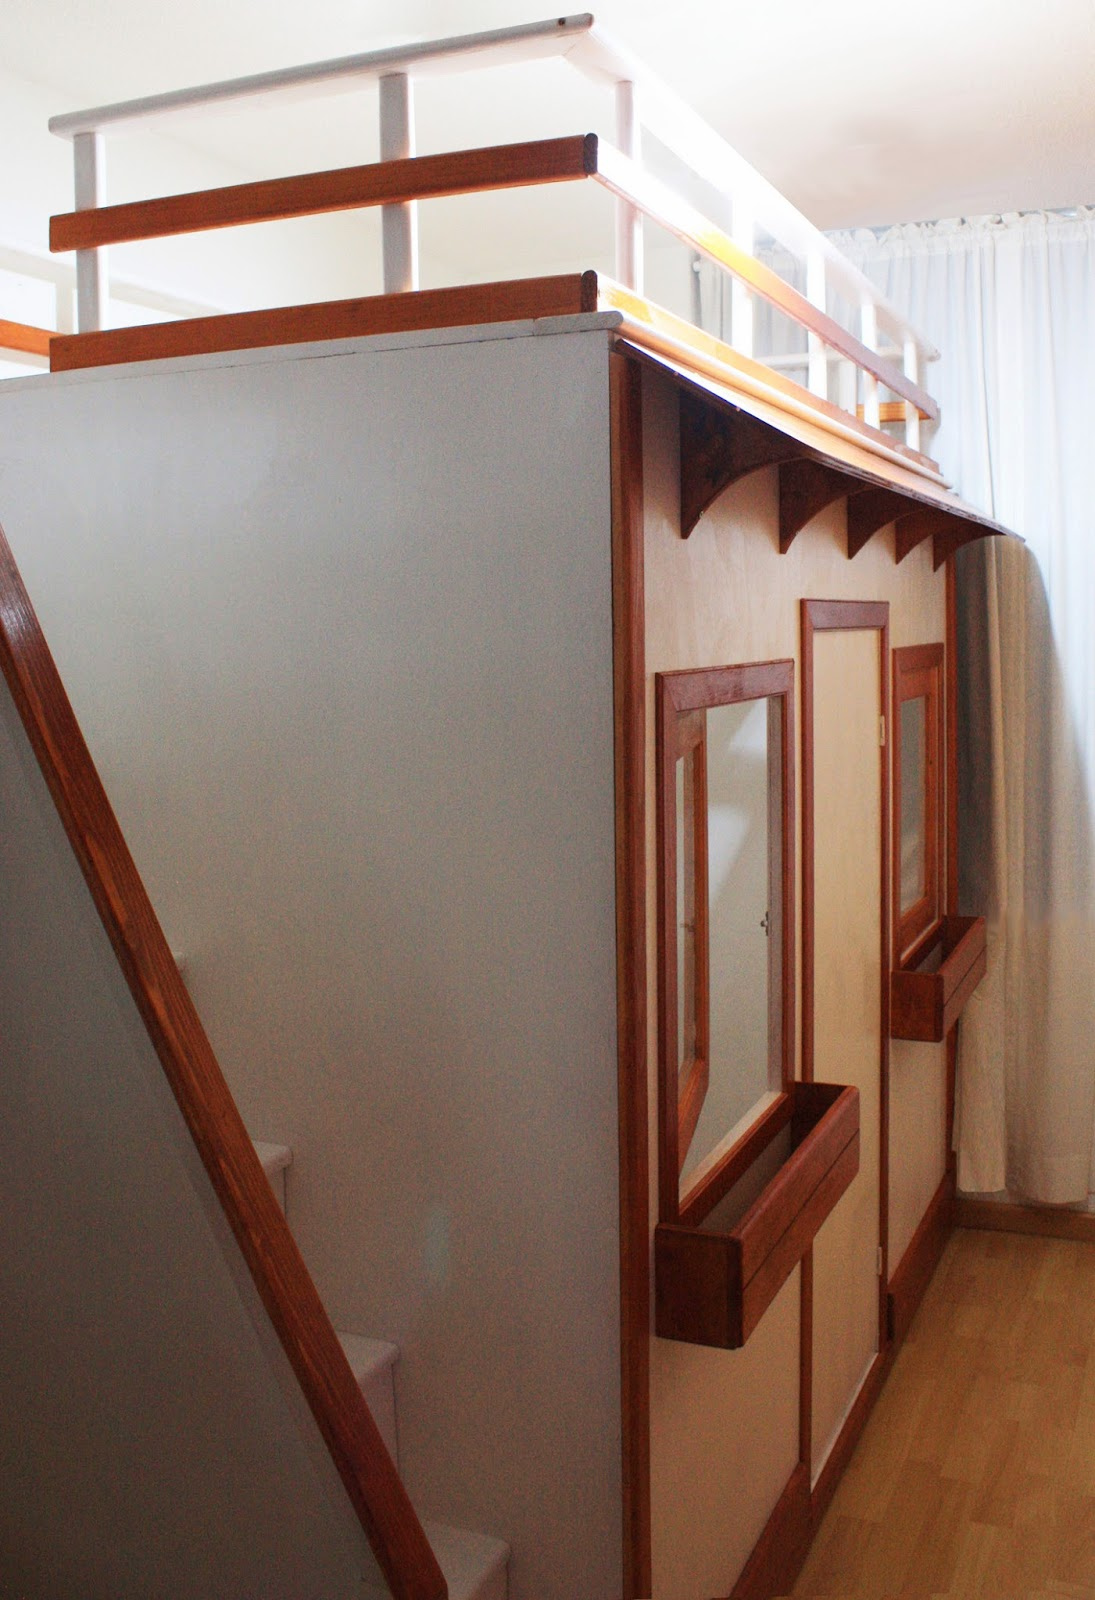 Rec mara de ni a litera y casita fabricada en madera for Recamara infantil nina